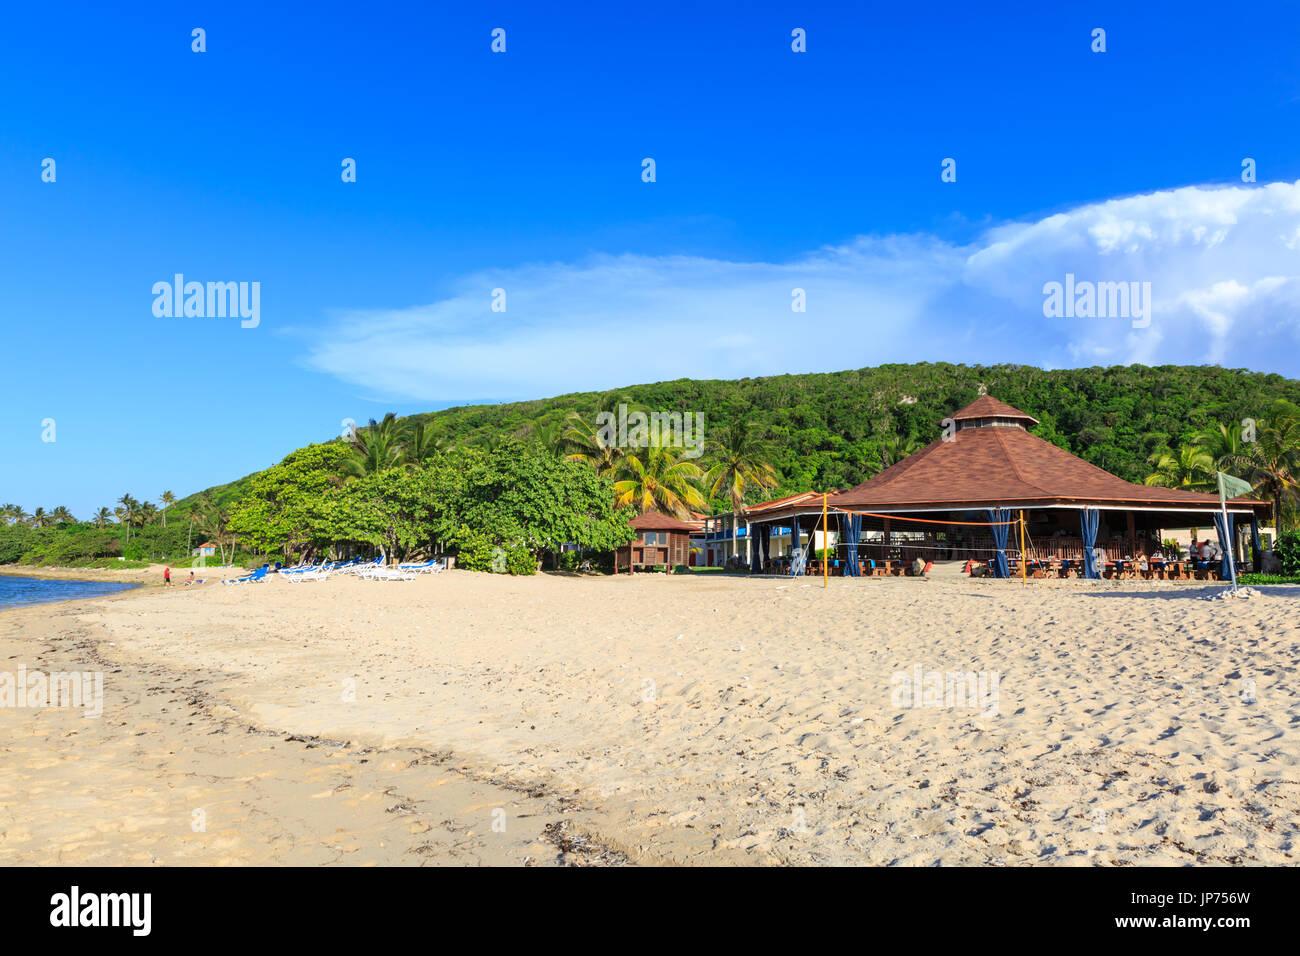 Jibacoa beach and beach bar of the Memories Jibacoa Hotel, Cuba - Stock Image